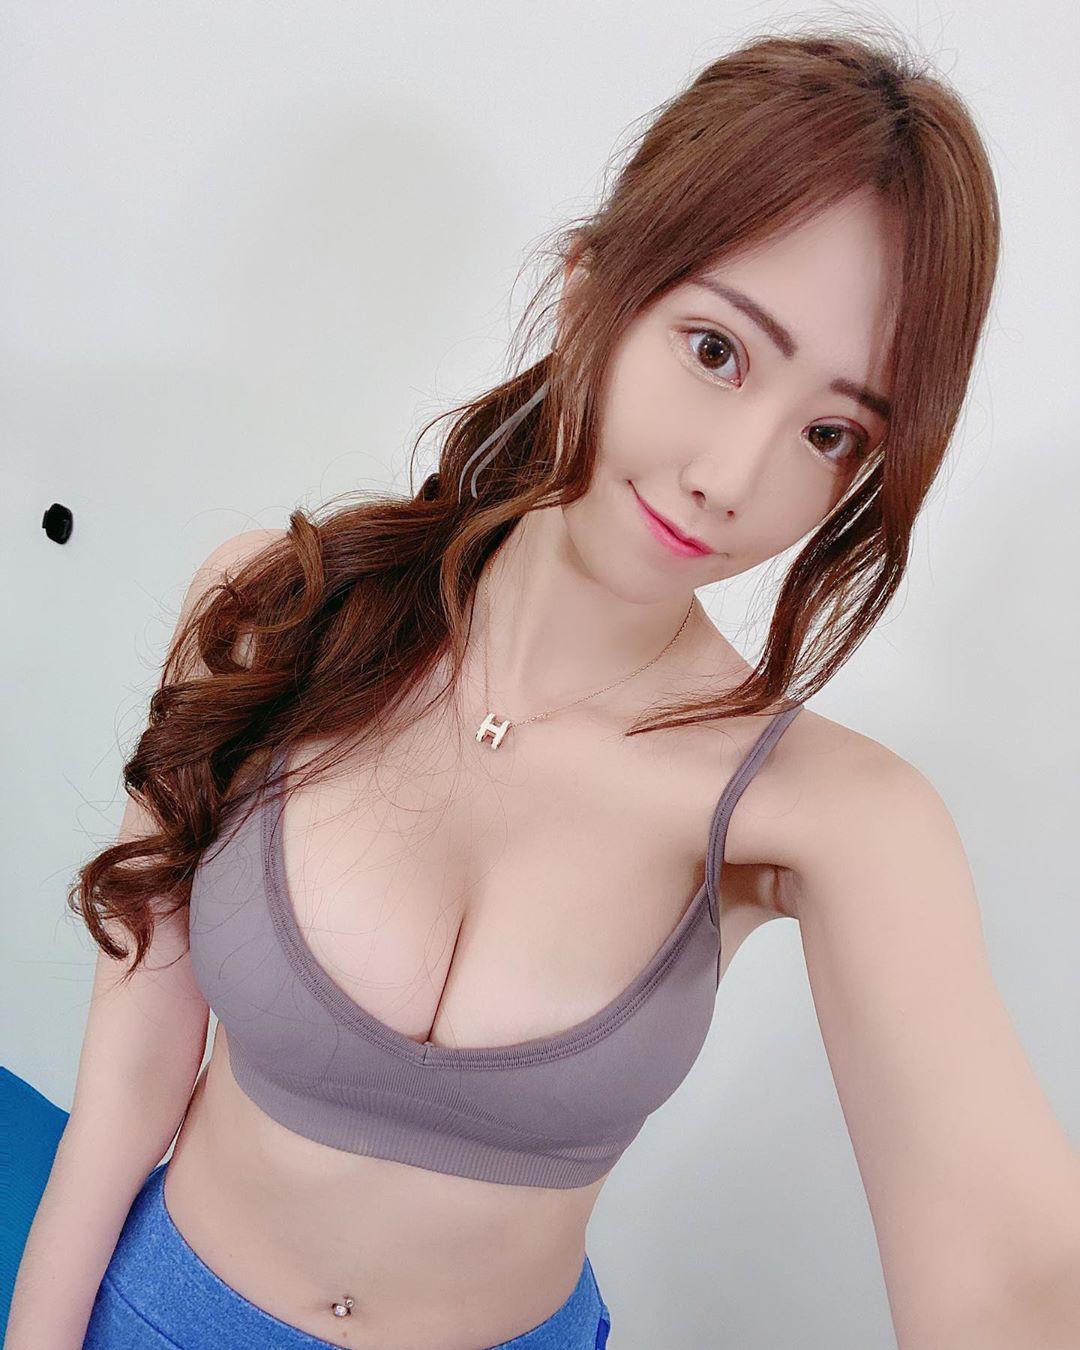 KBRcz7gy o - IG正妹—Micky 吳芸帆